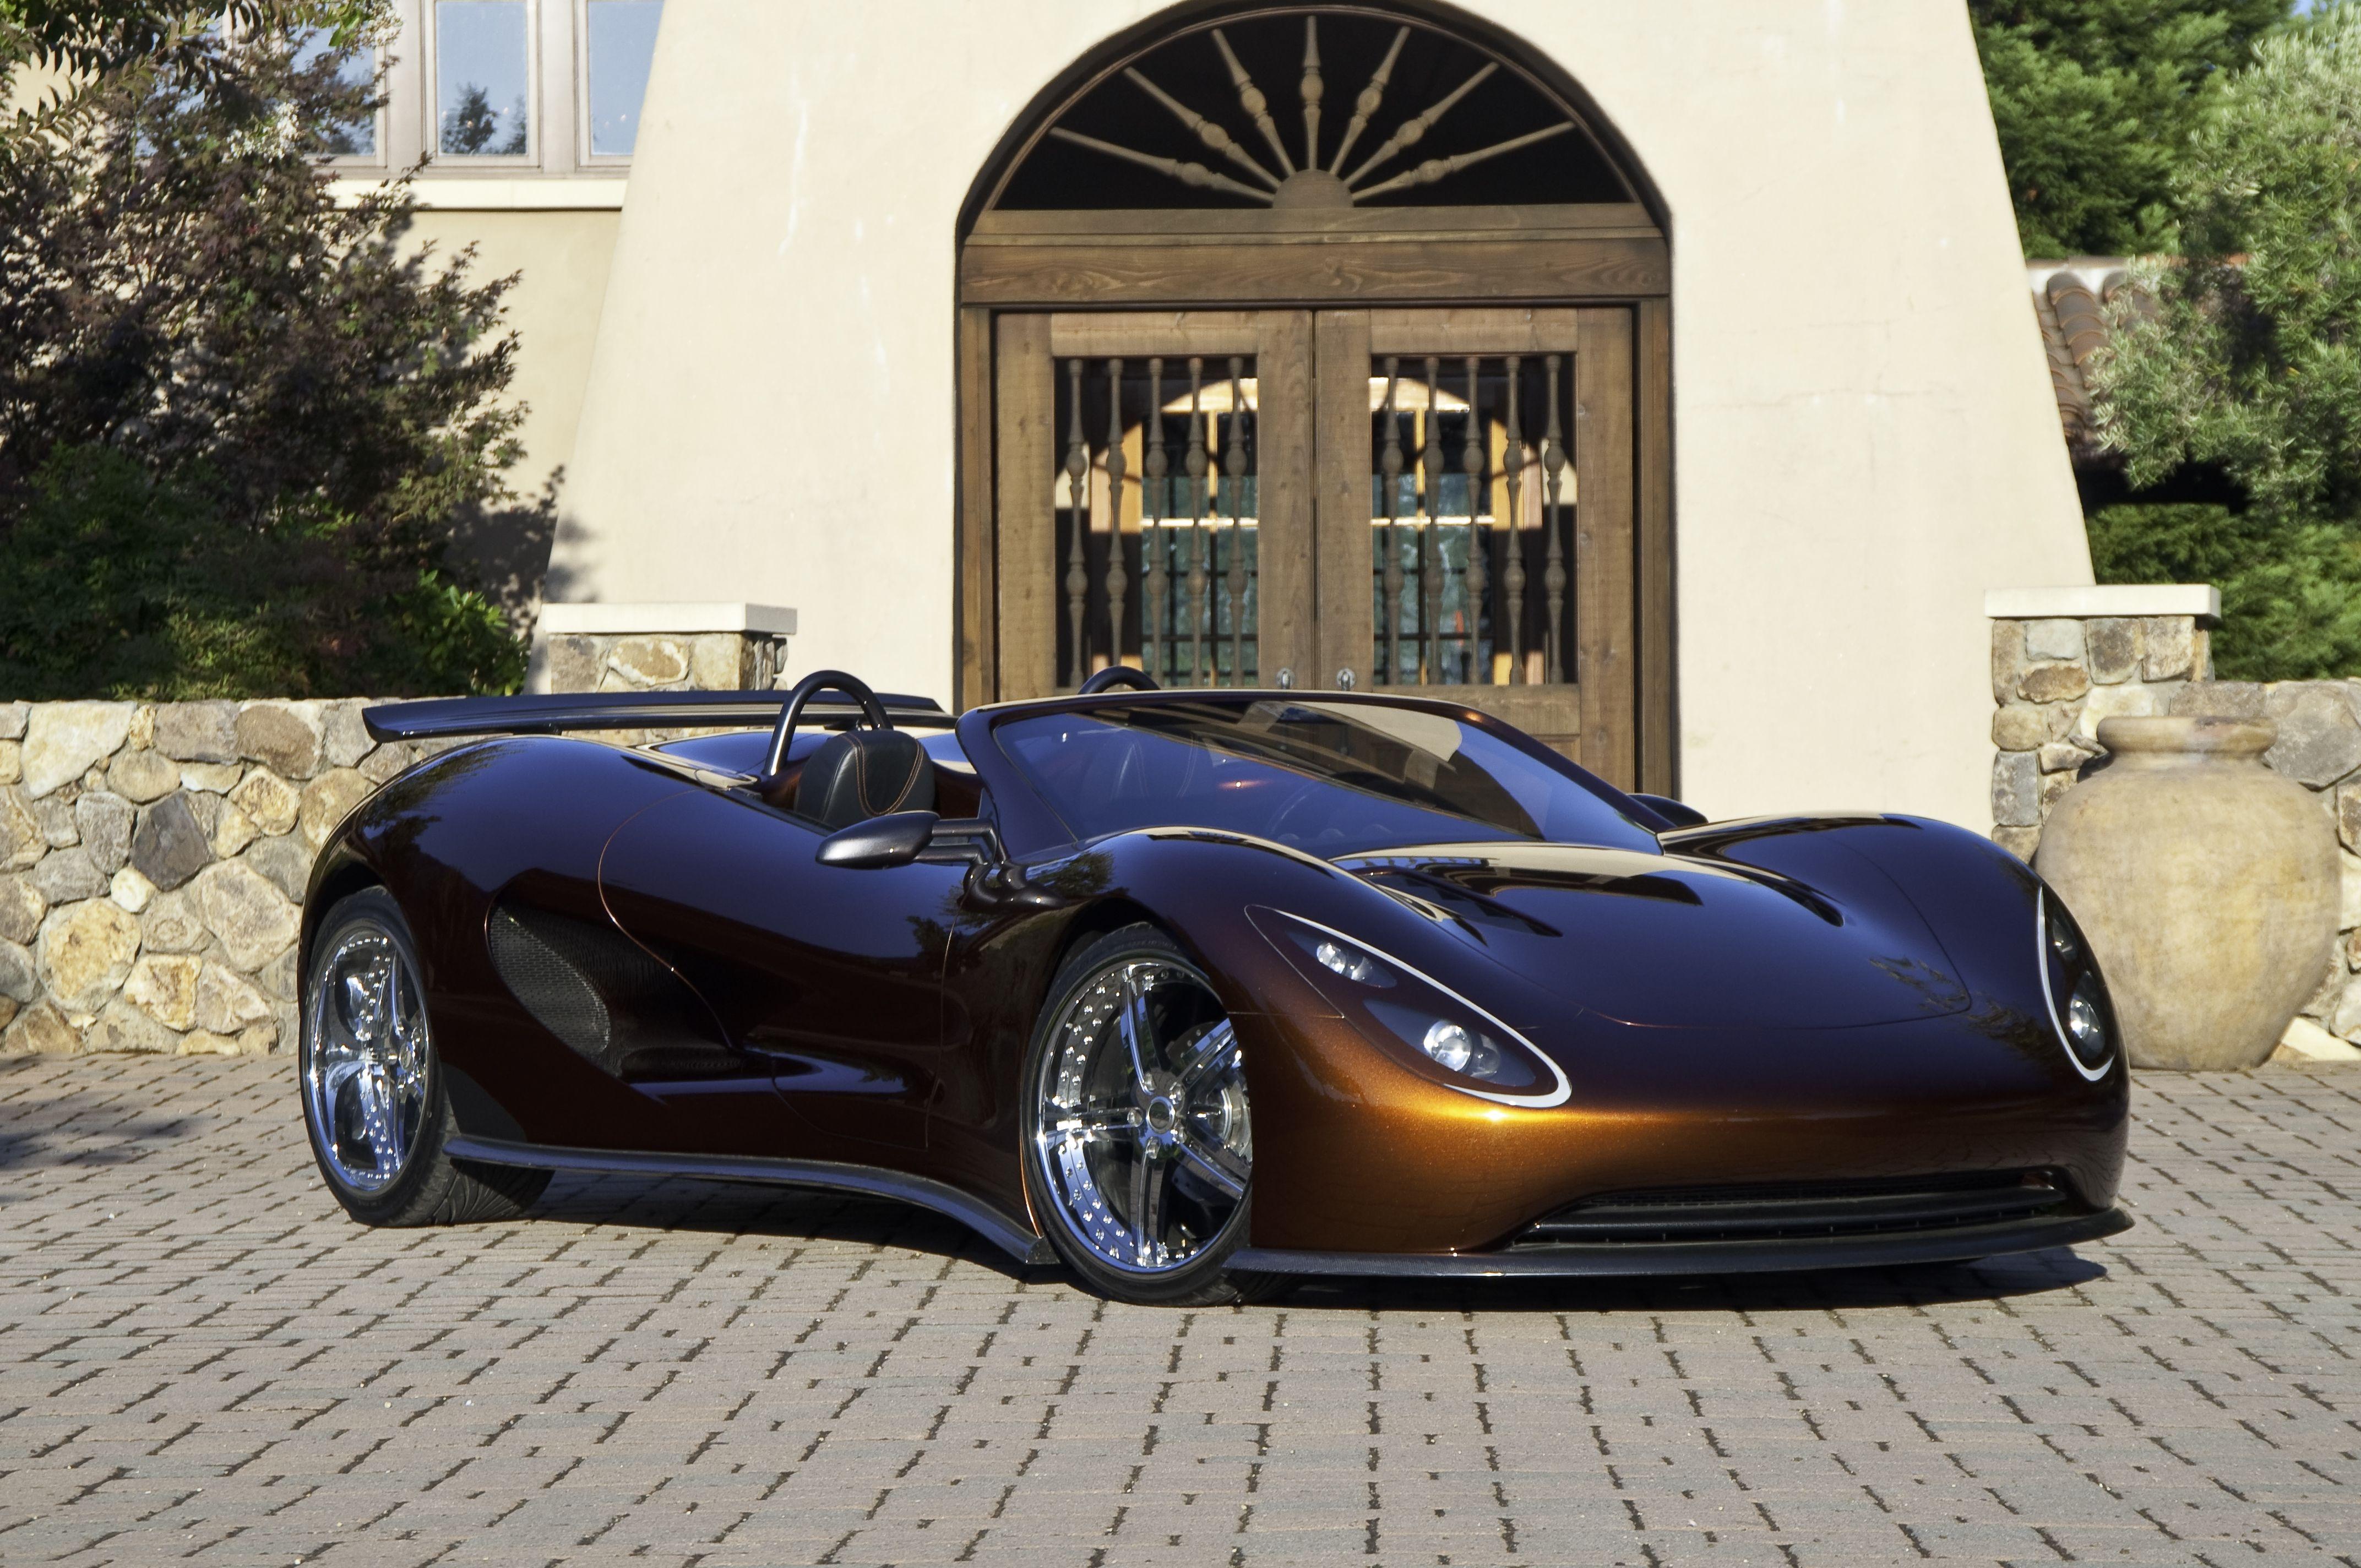 Scorpion Hydrogen Car For Sale